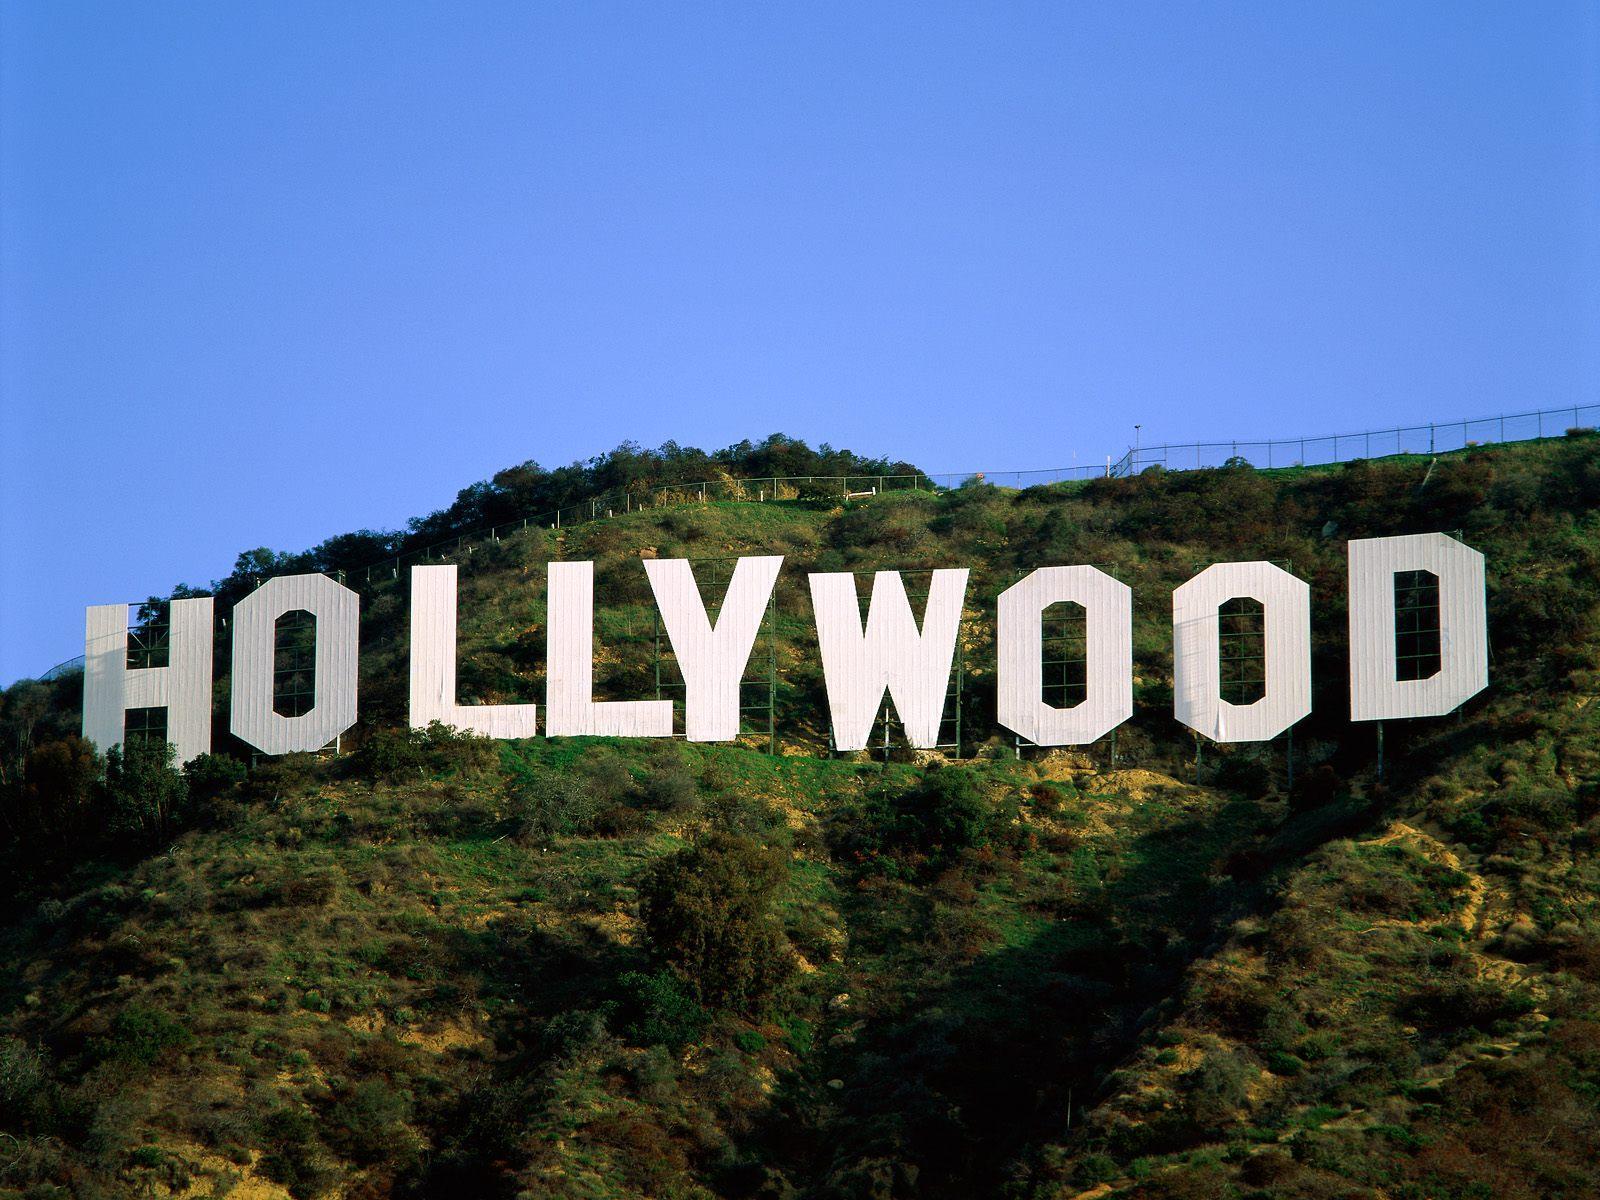 Hollywood4593414747 - Hollywood - Hollywood, Grenoble